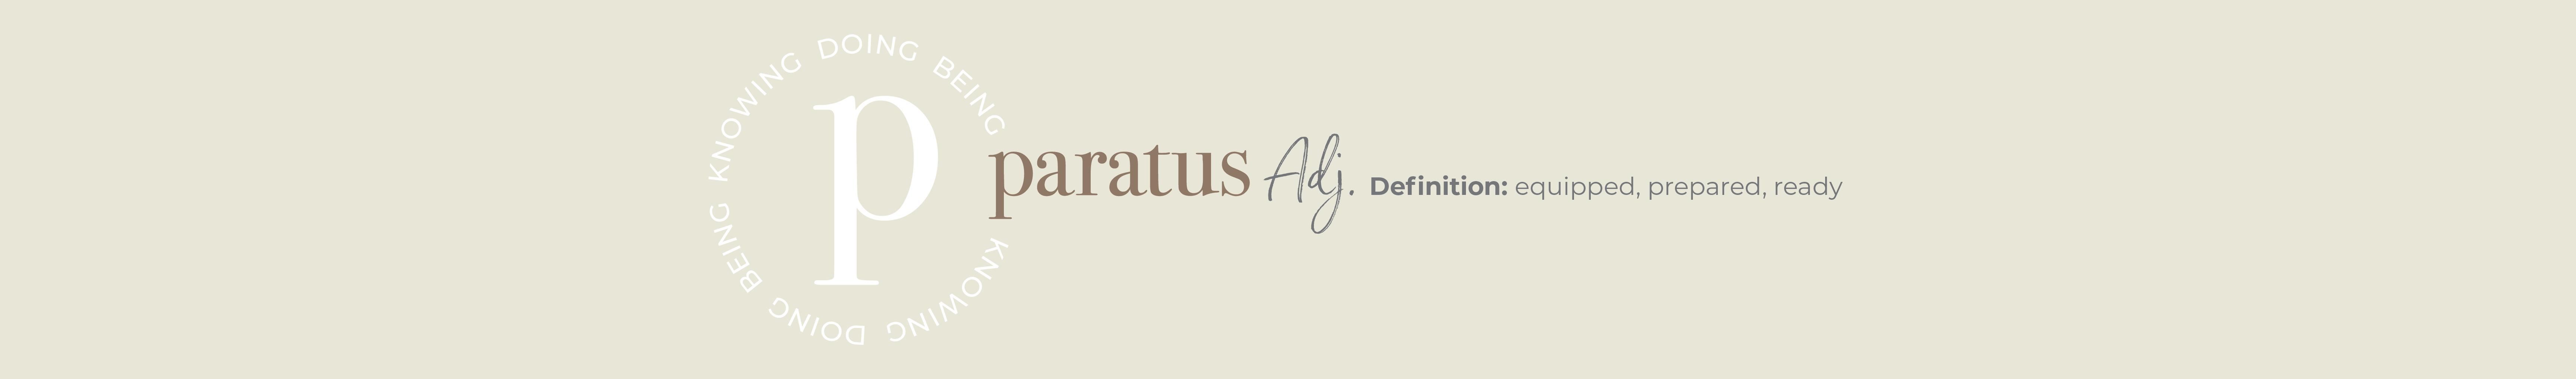 Paratus logo and definition.